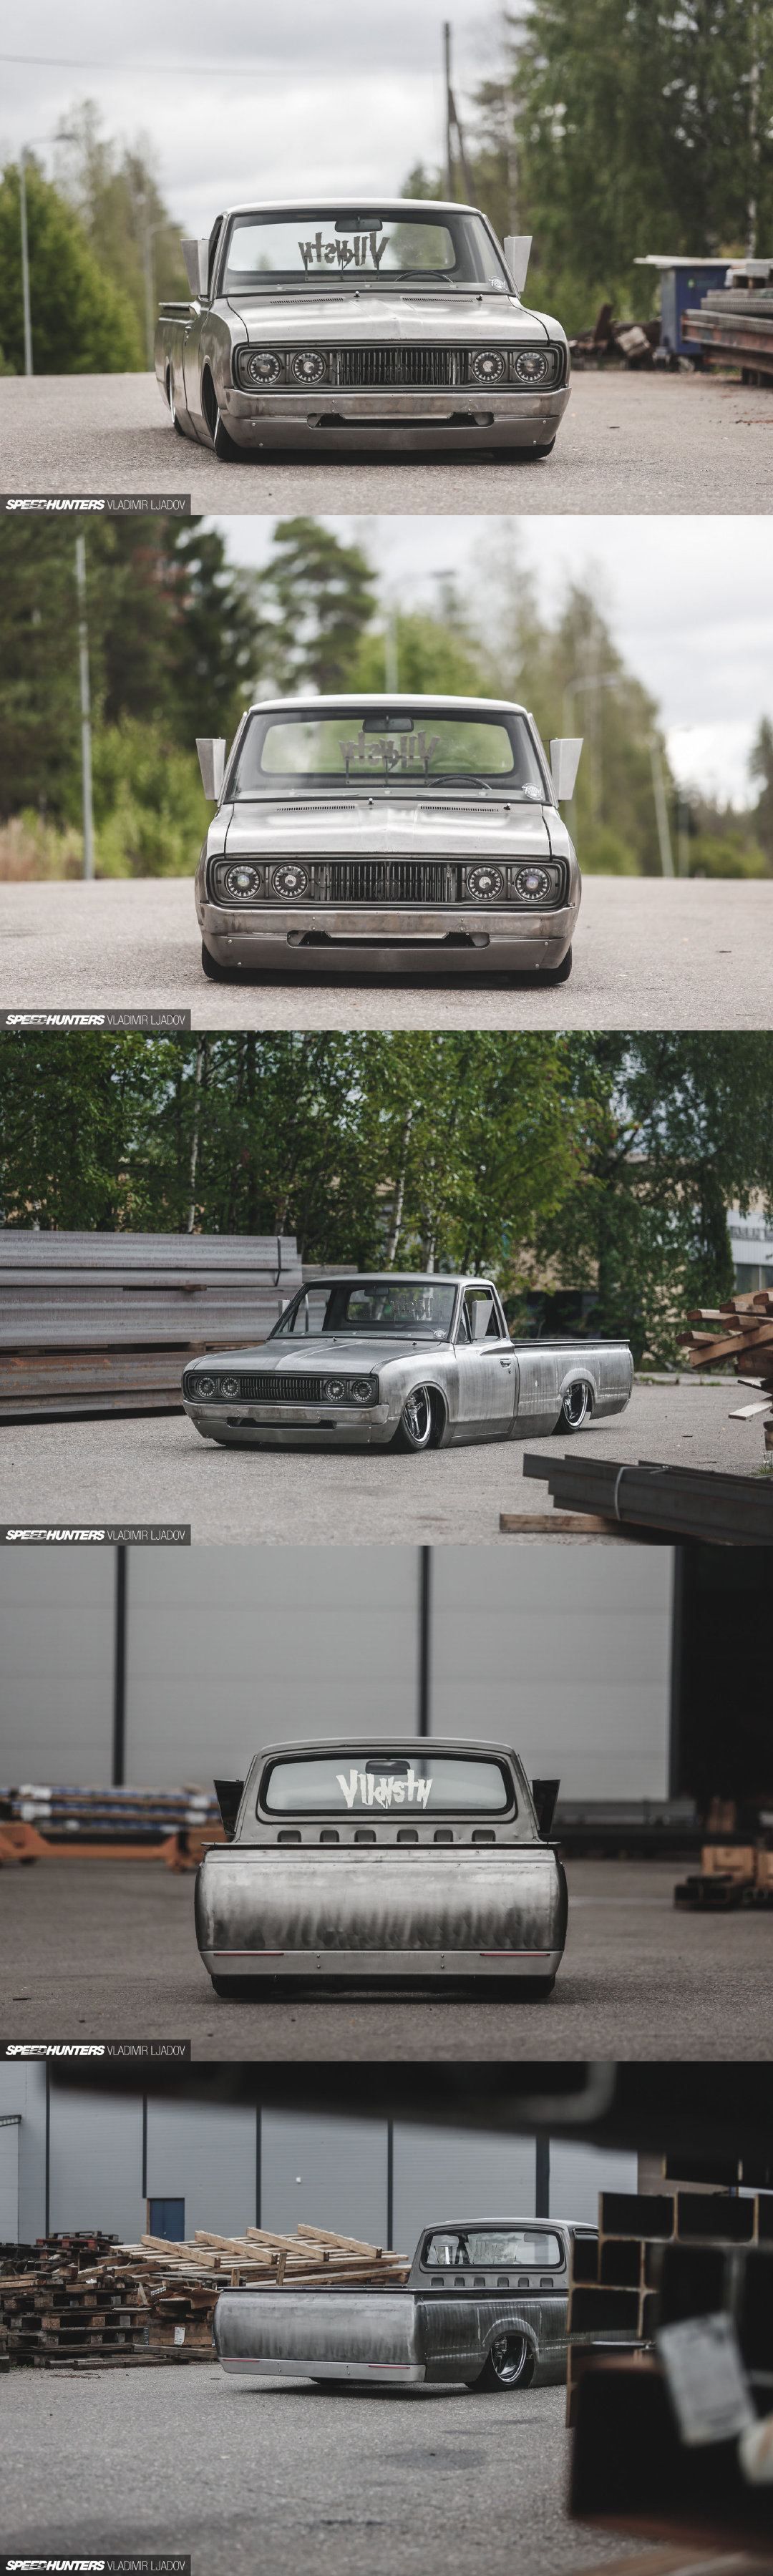 No Paint, No Problem: A Heavy Metal Datsun 620 Pickup